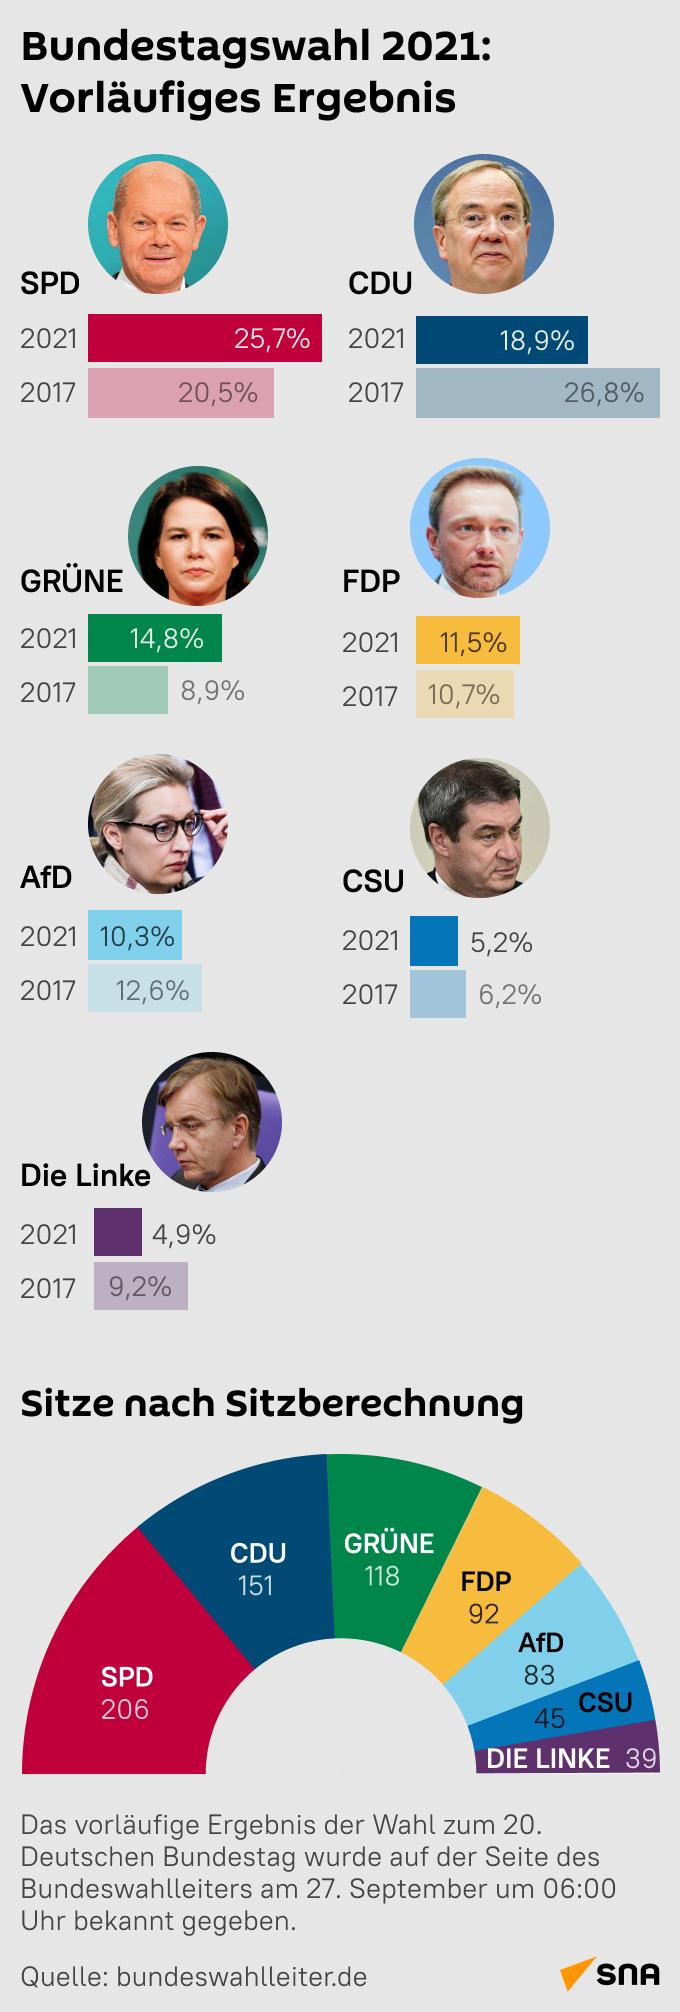 Ergebnis der Bundestagswahl - SNA